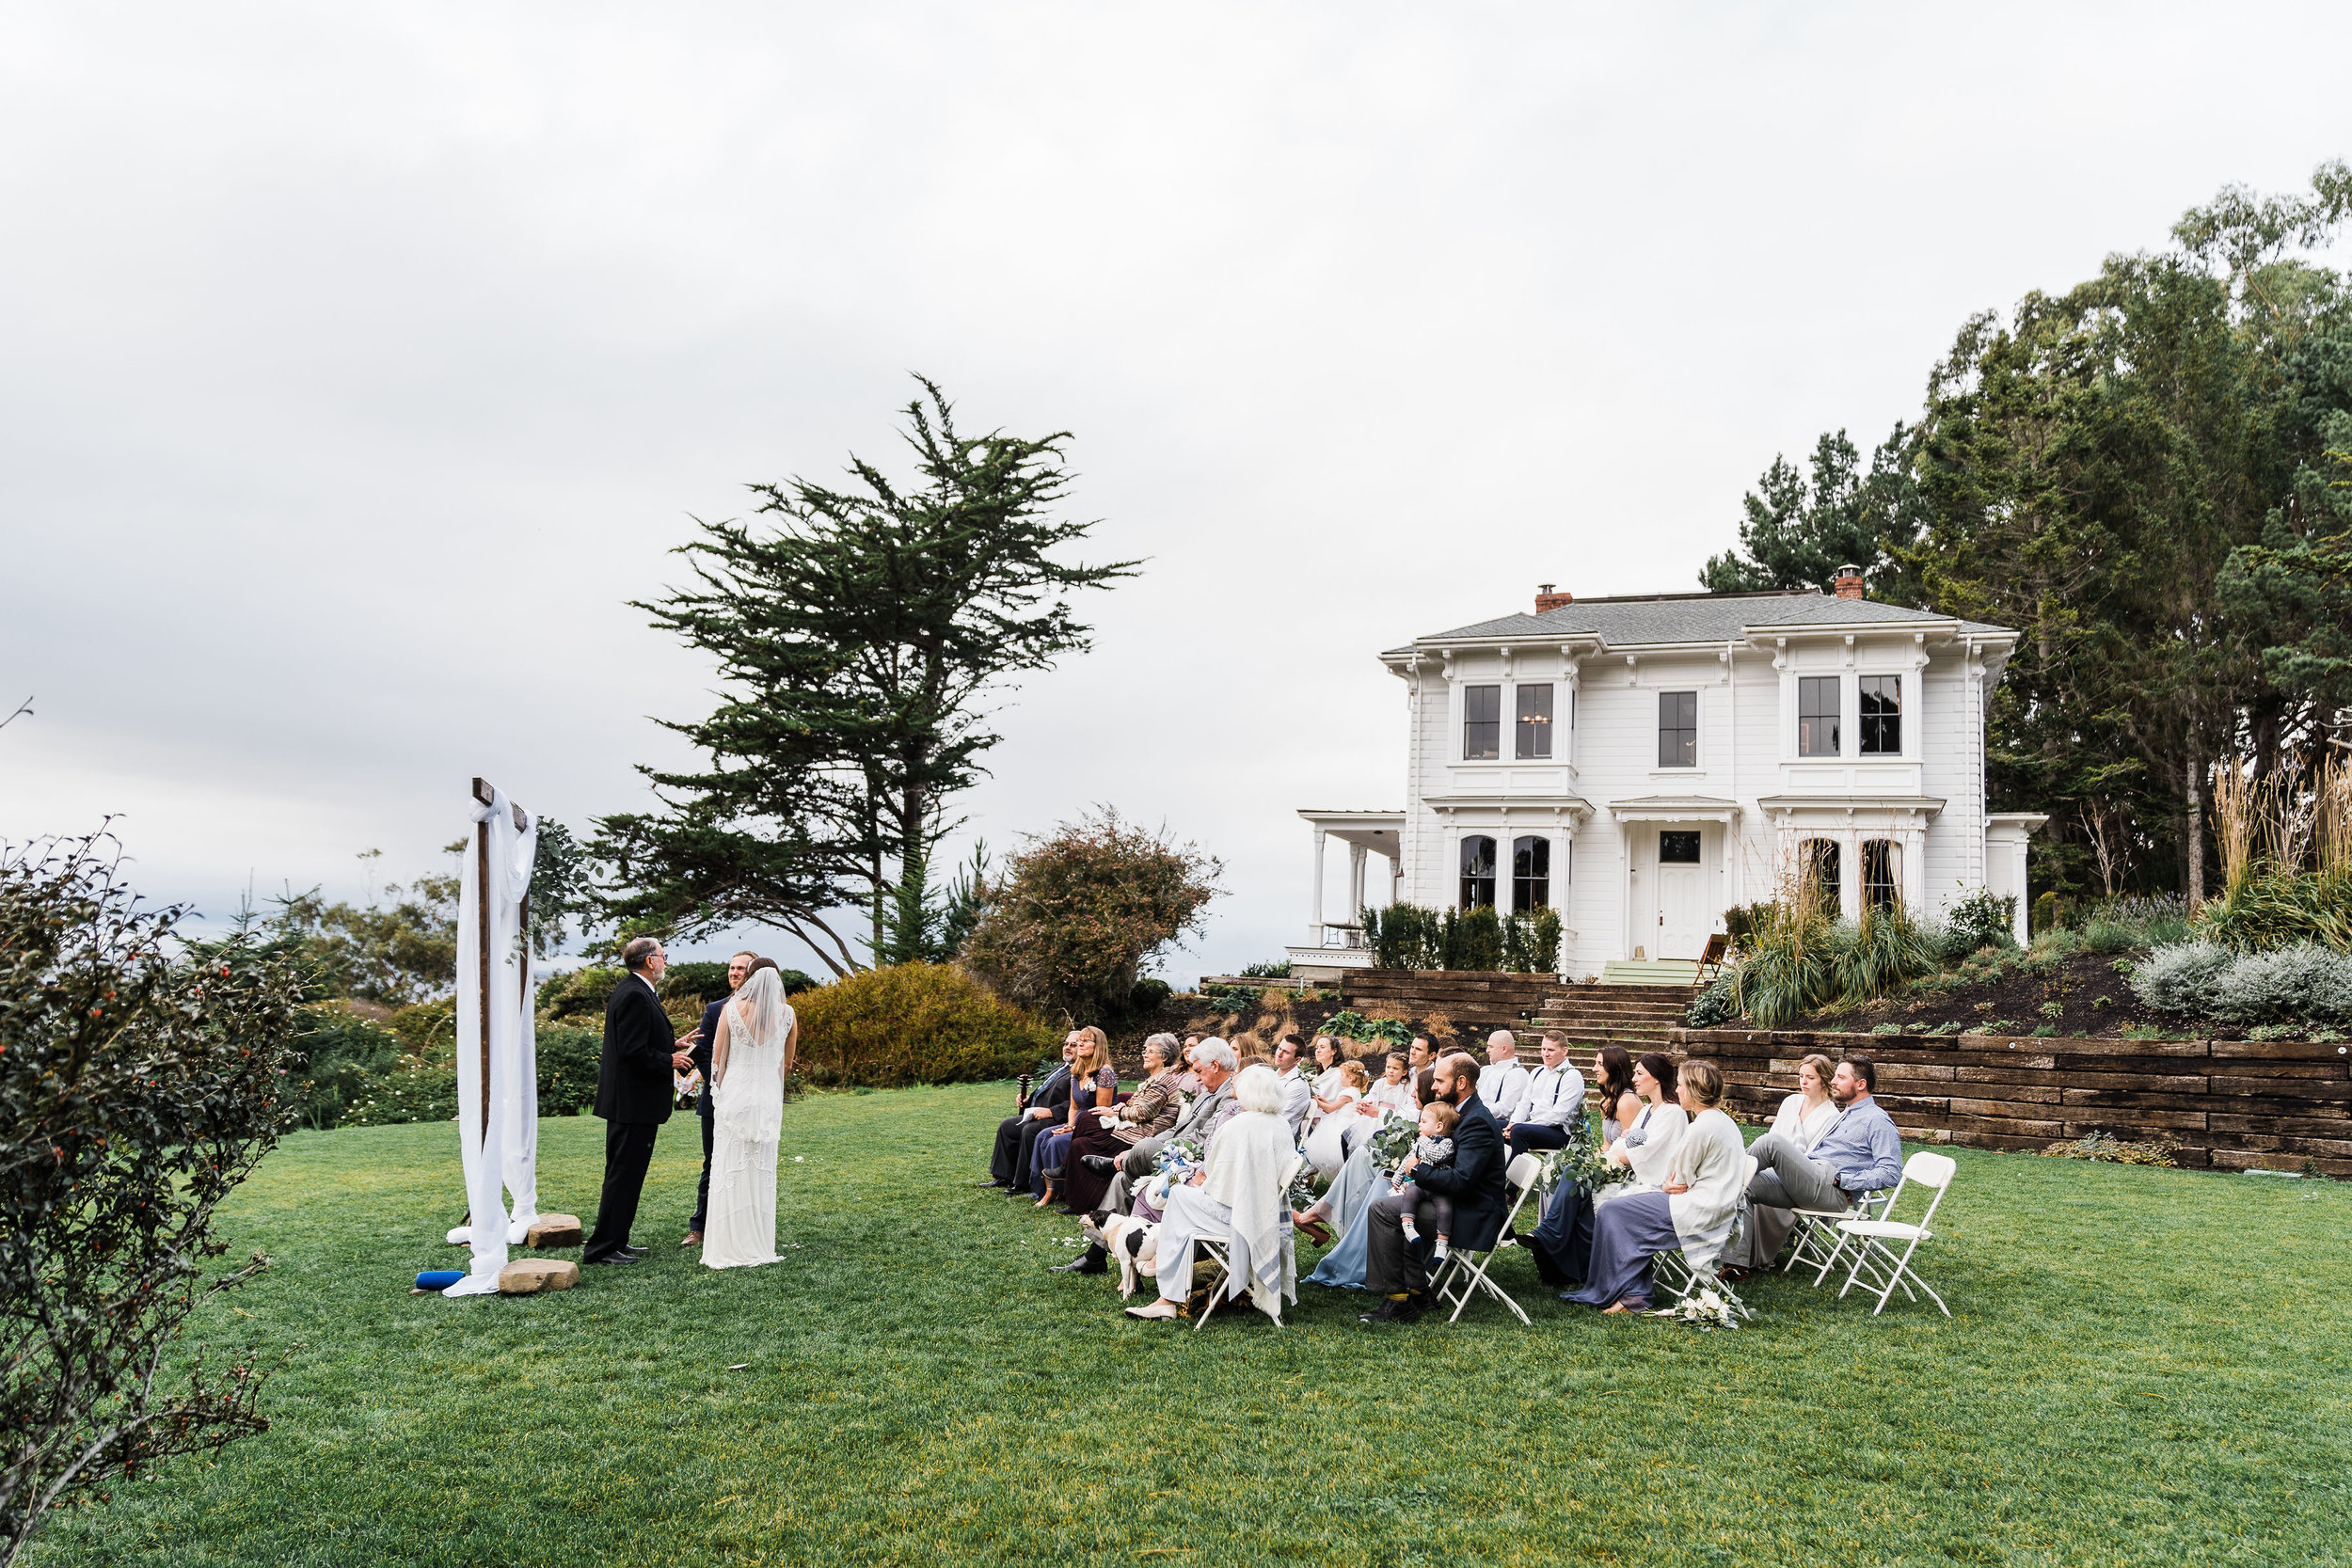 switzer-farm-wedding-westport-brandon-bibbins-photograhy-fine-art-060.jpg